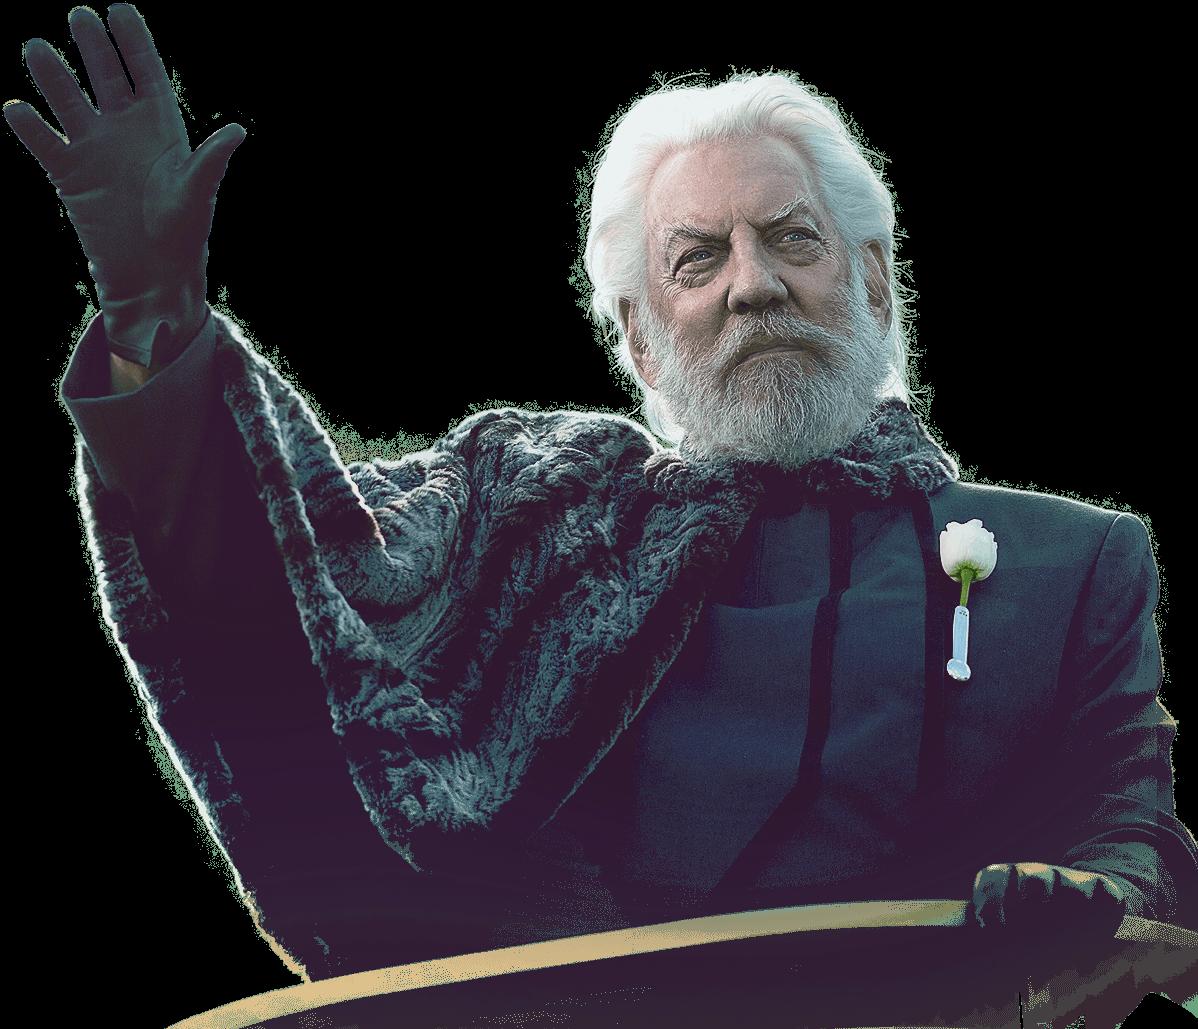 Presidente Coriolanus Snow - Wiki The Hunger Games